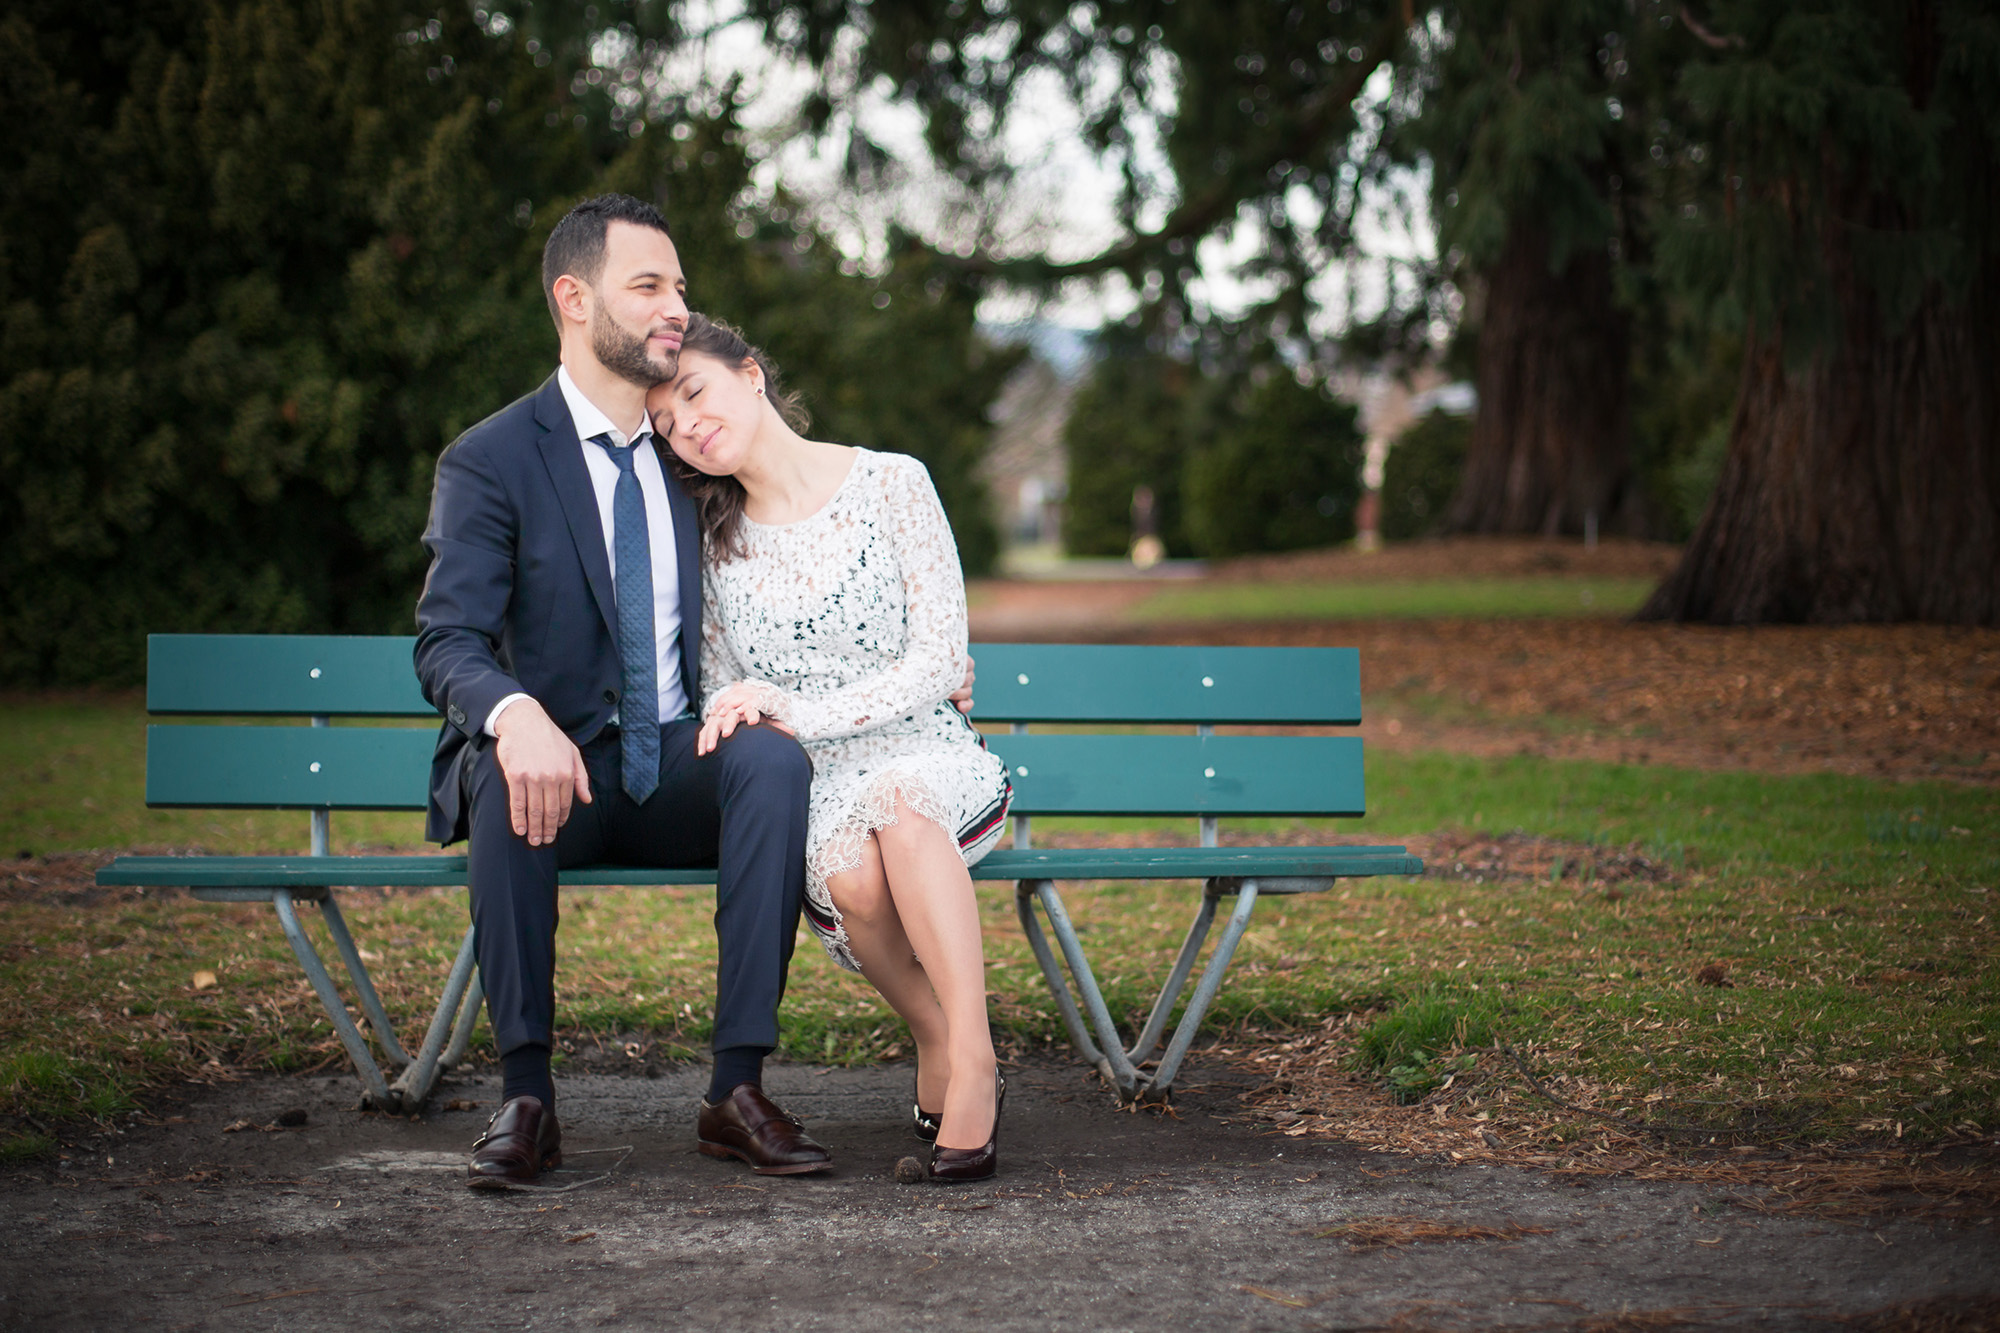 couple mariage bride groom wedding banc